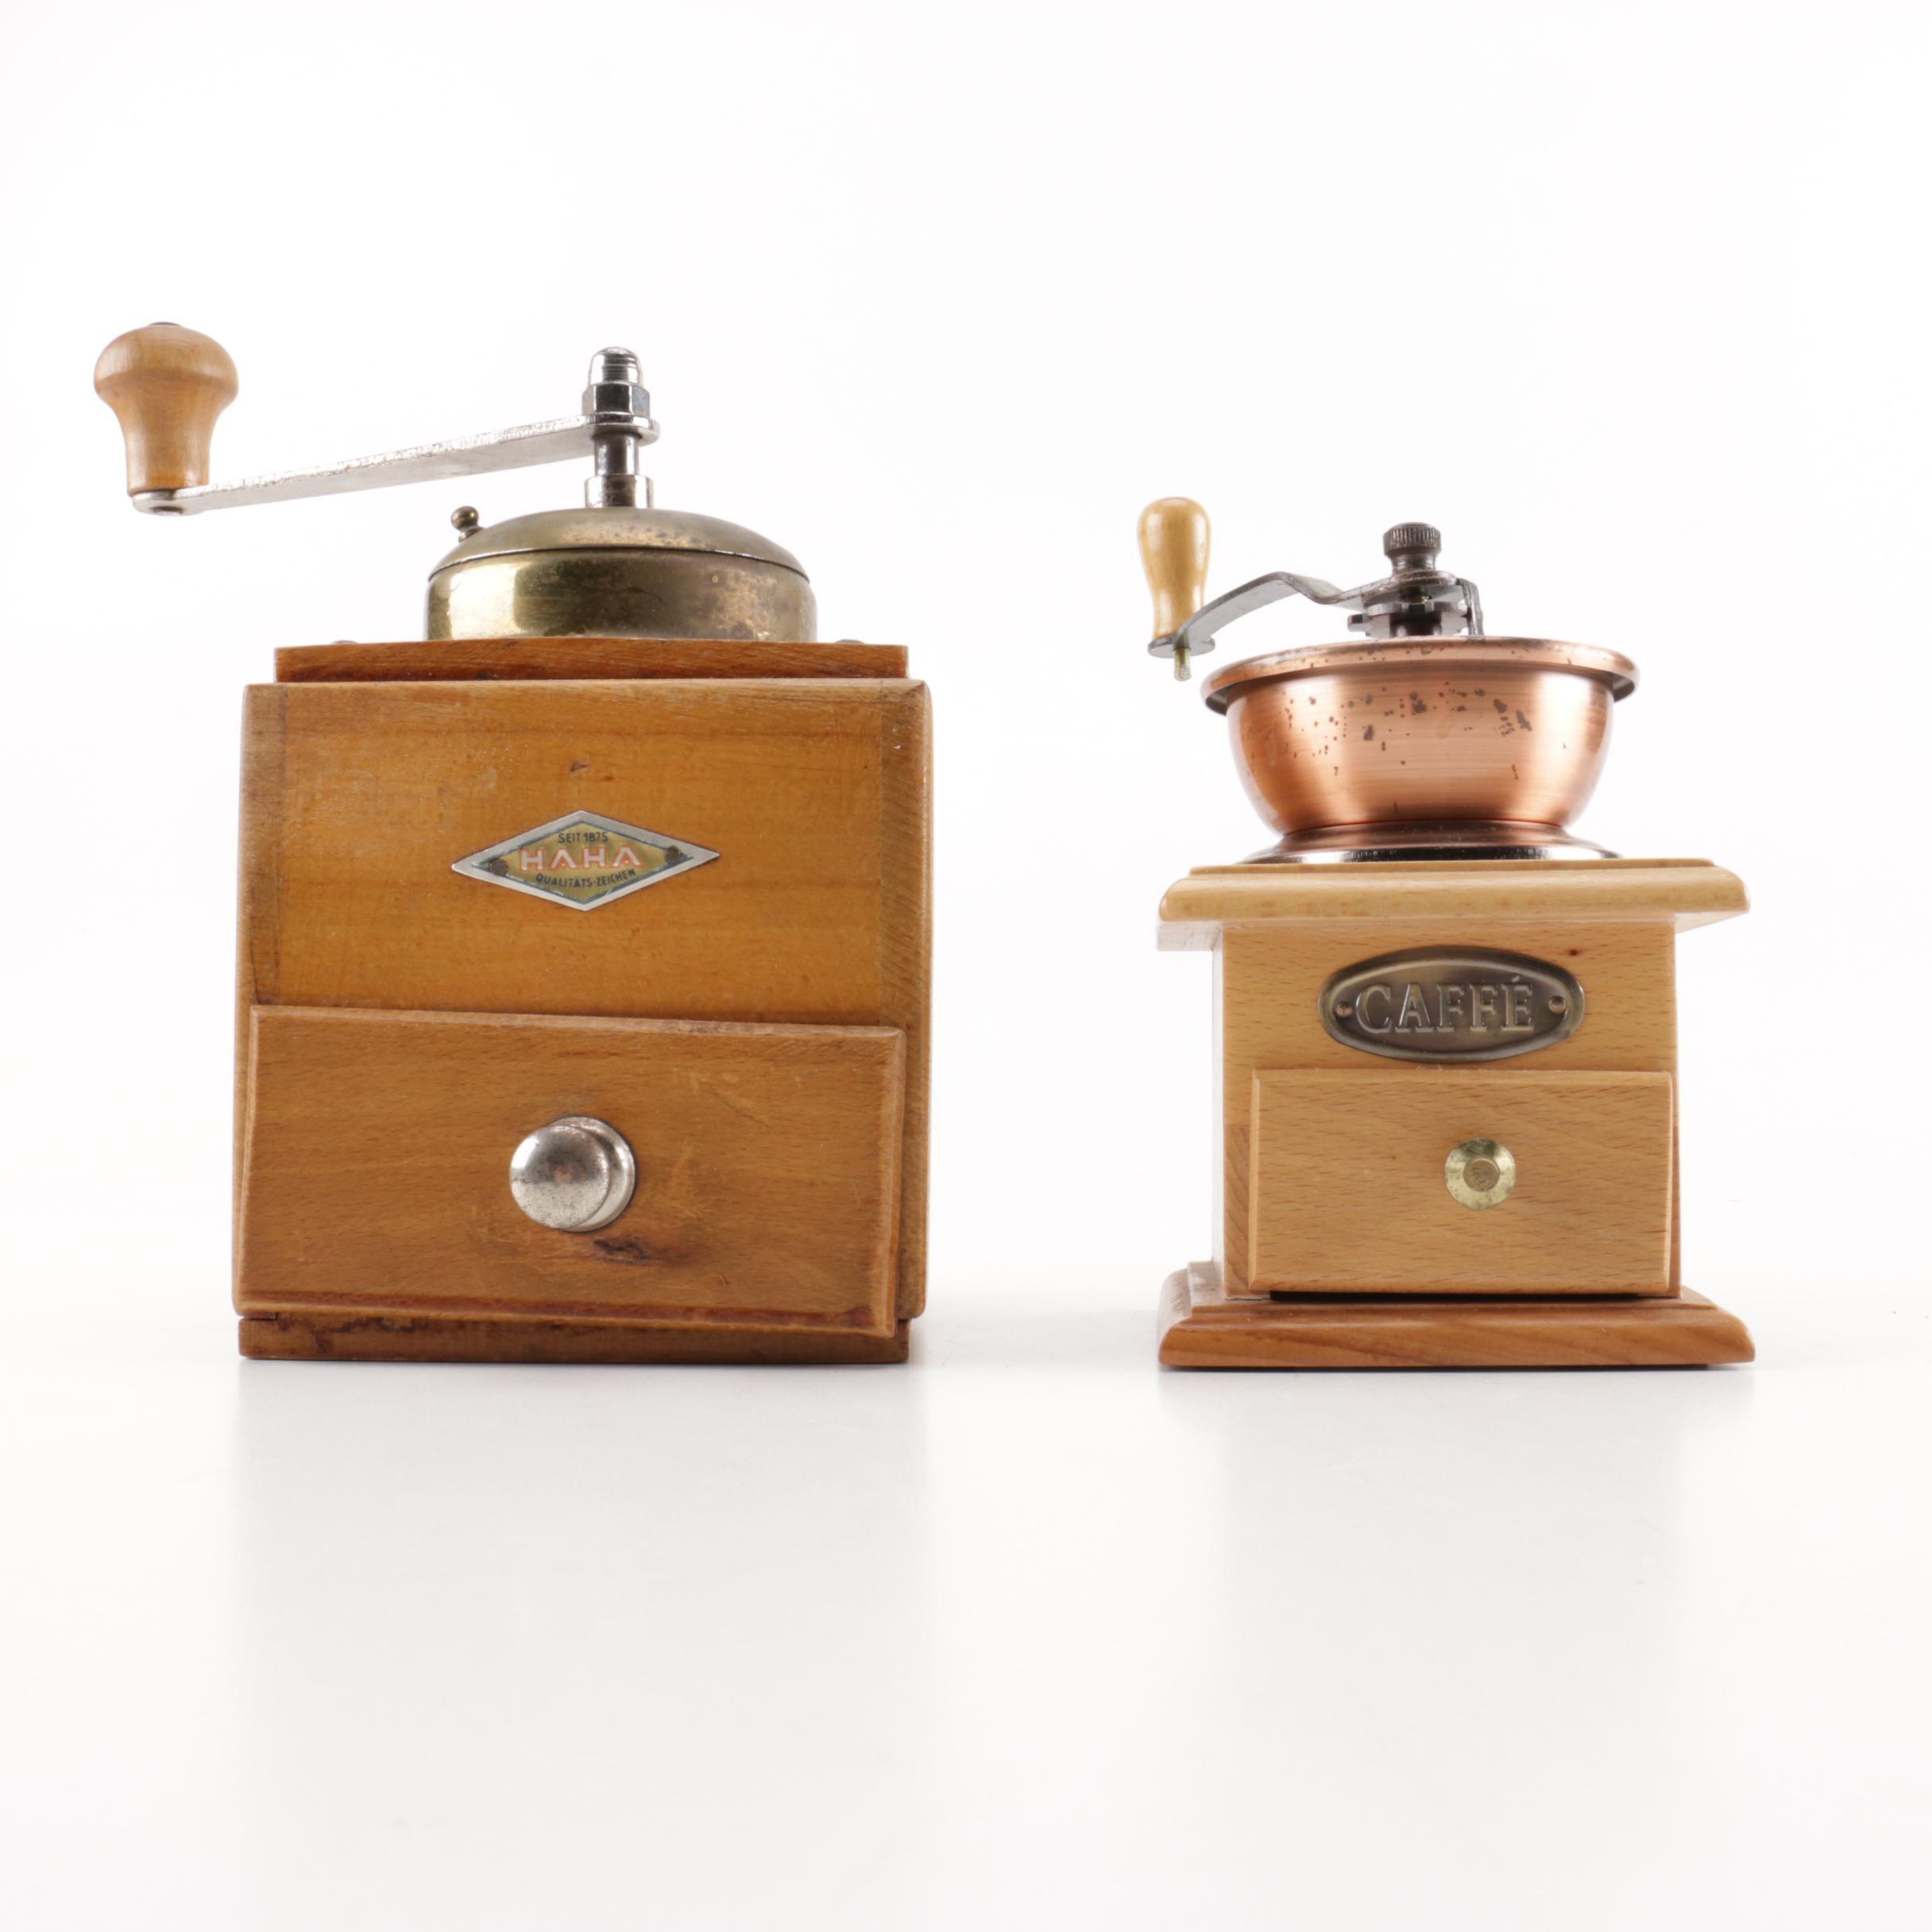 Pair of Wood and Metal Coffee Grinders Including HAHA